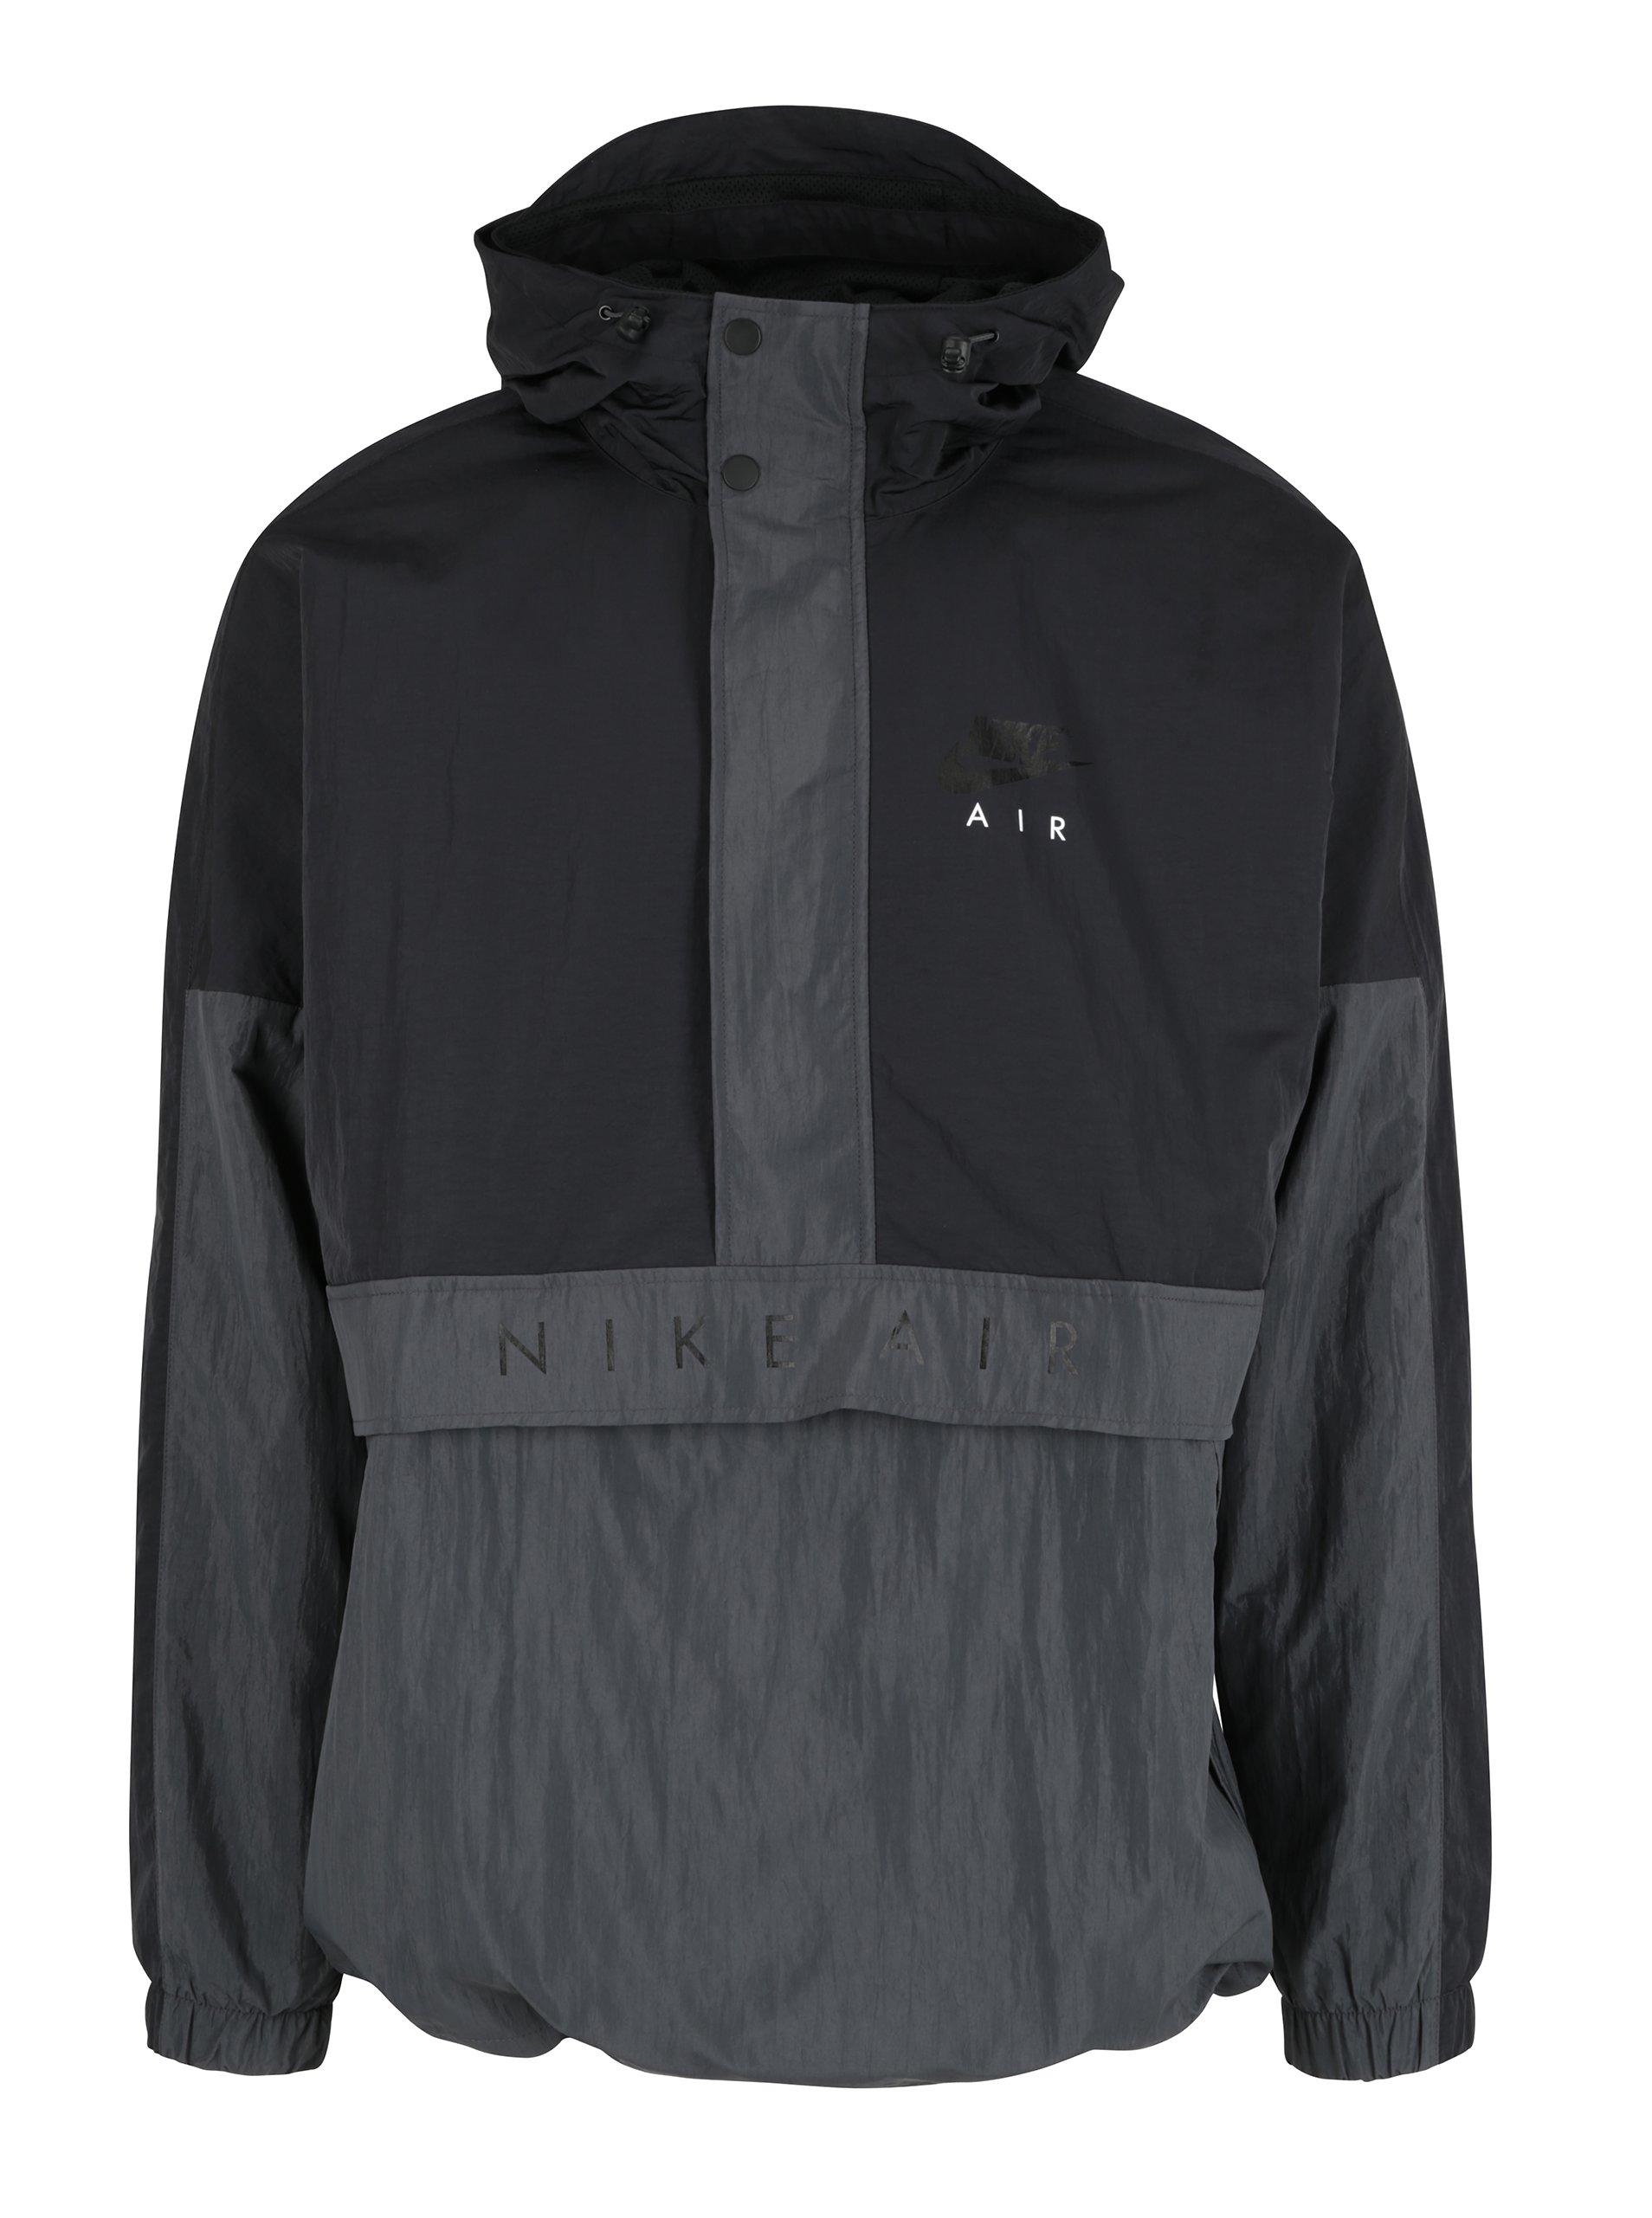 Černá pánská bunda s kapucí Nike Sportswear Air